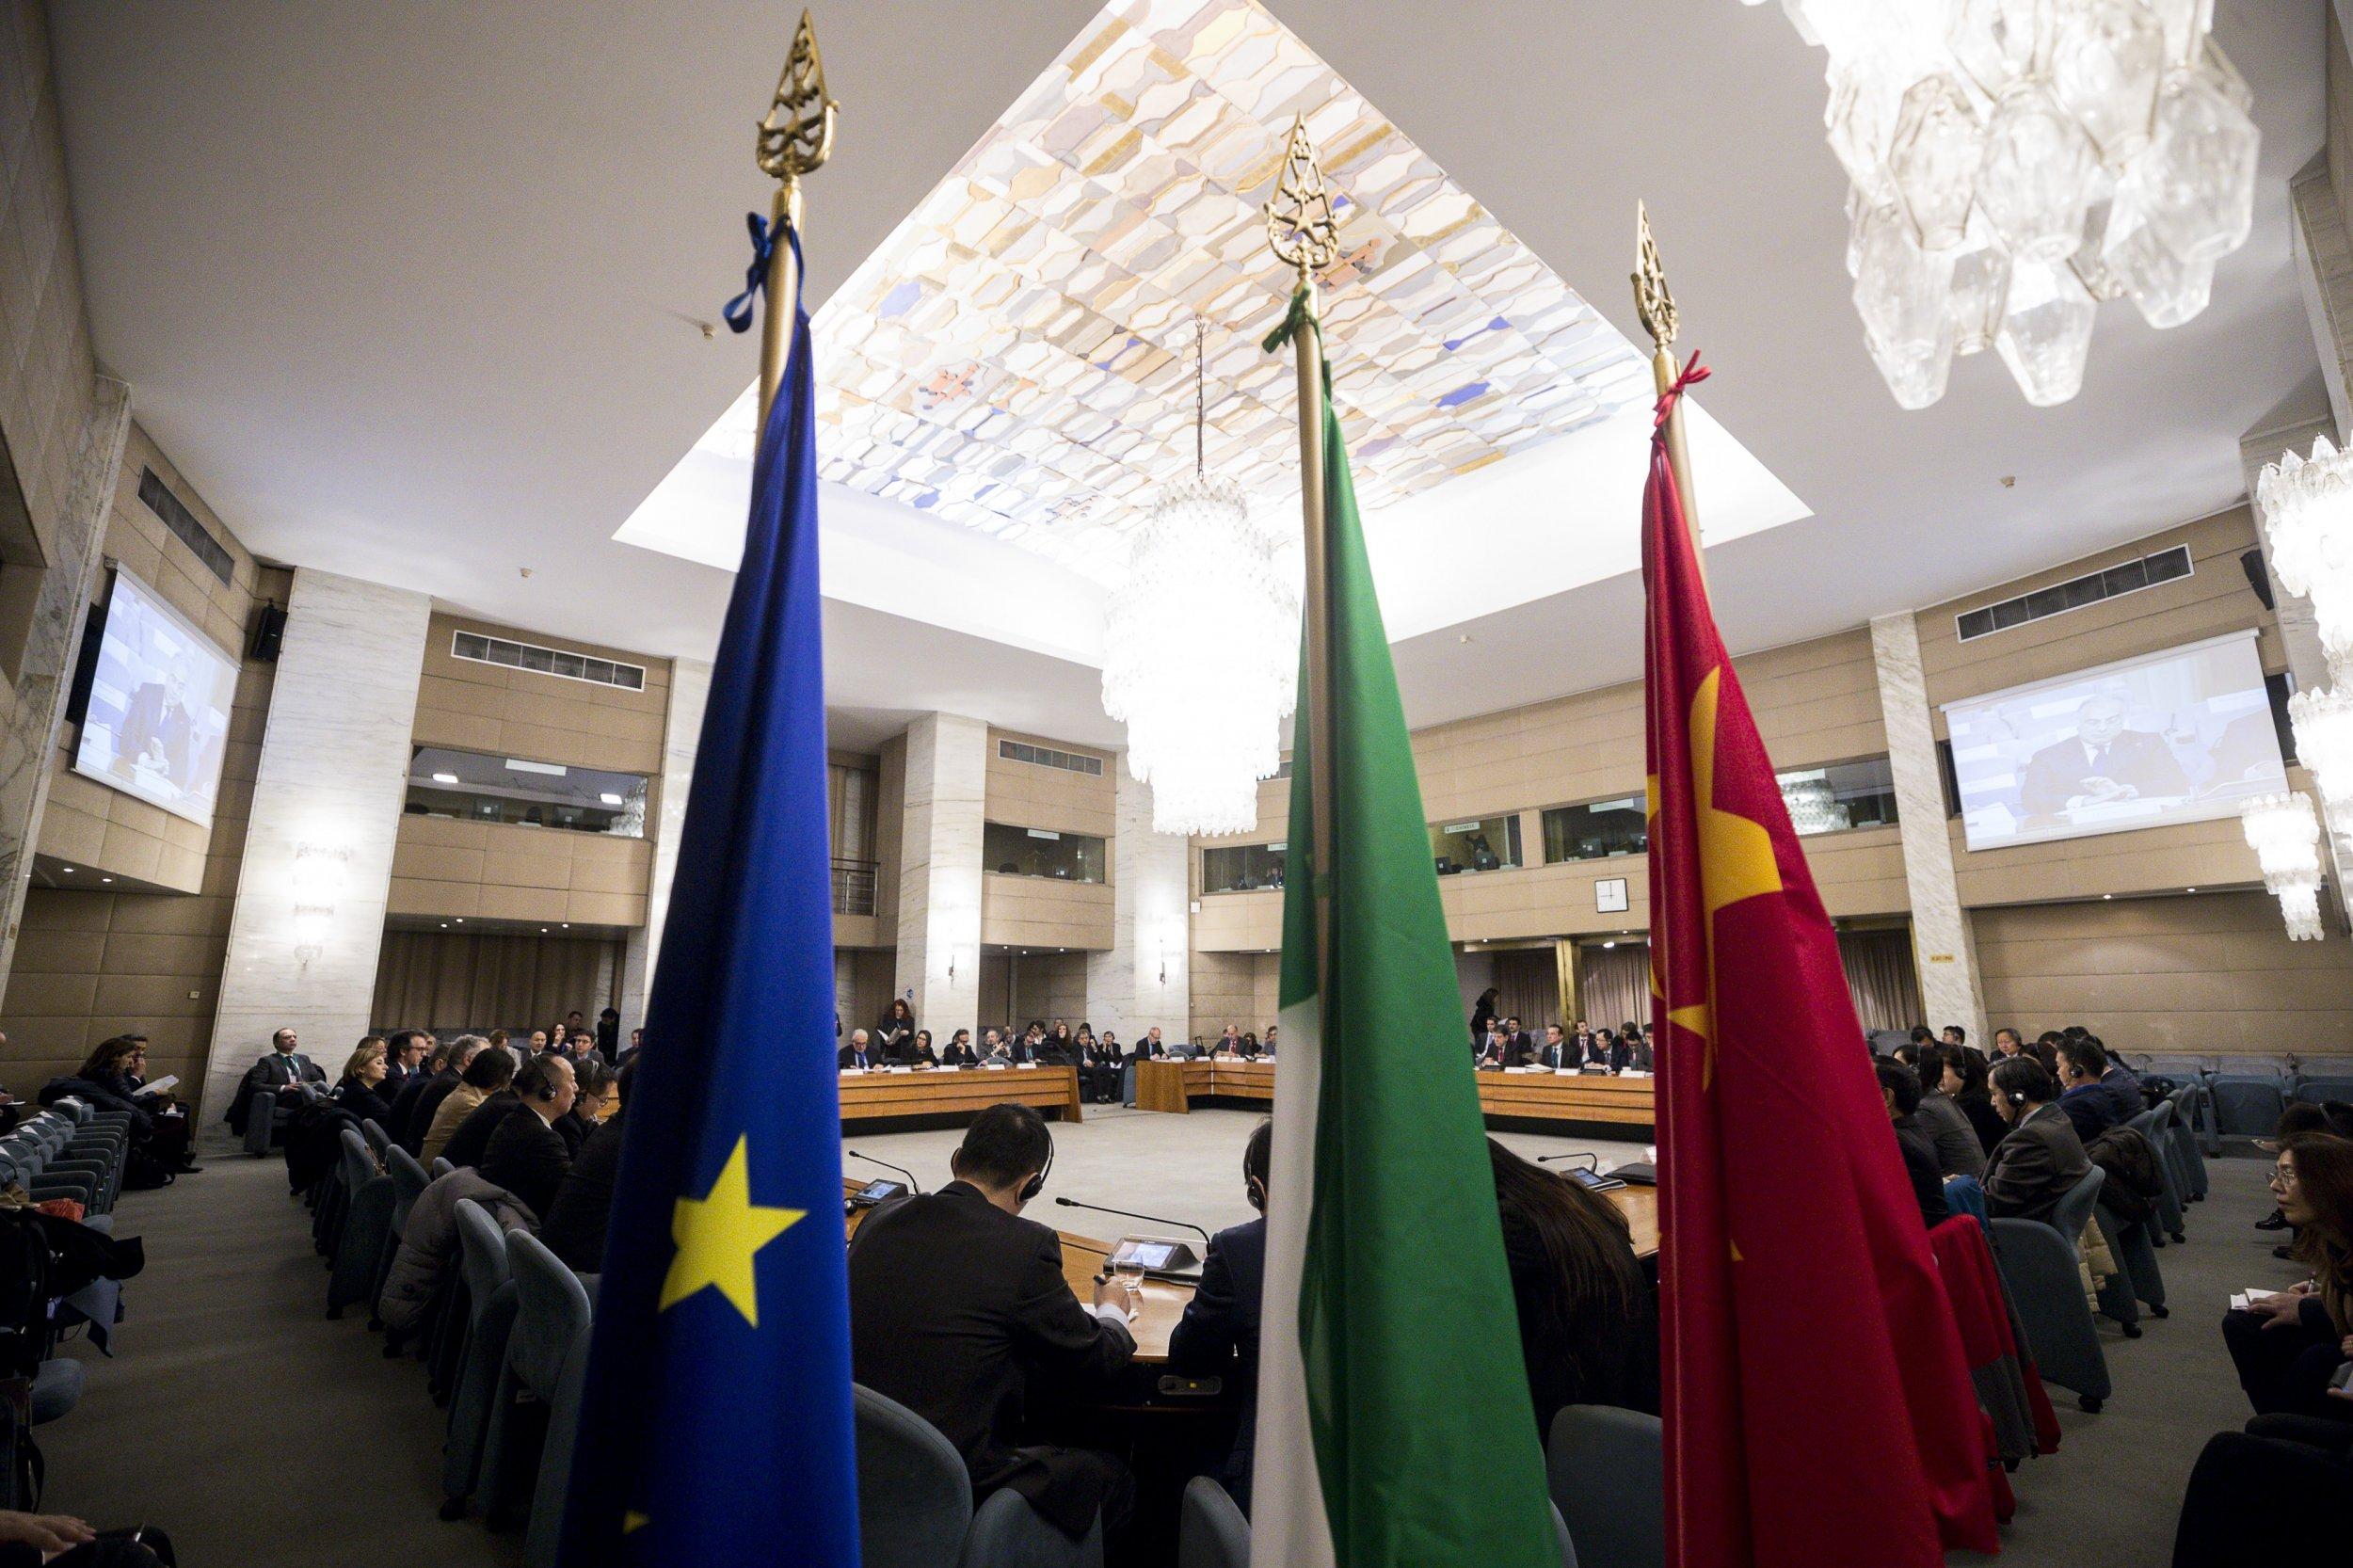 china, italy, economy, trade, meeting, europe